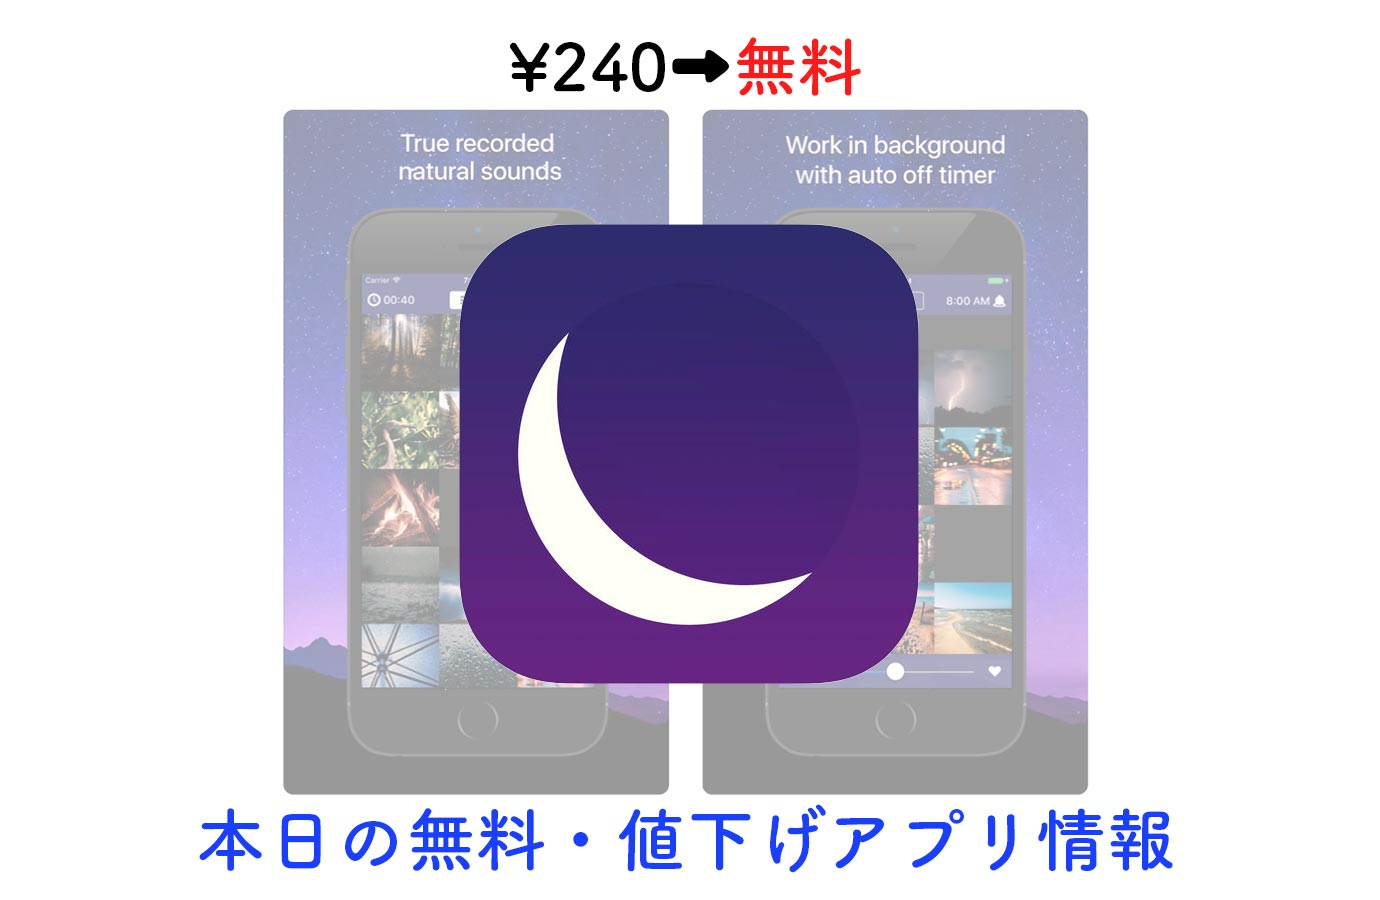 Appsale0530